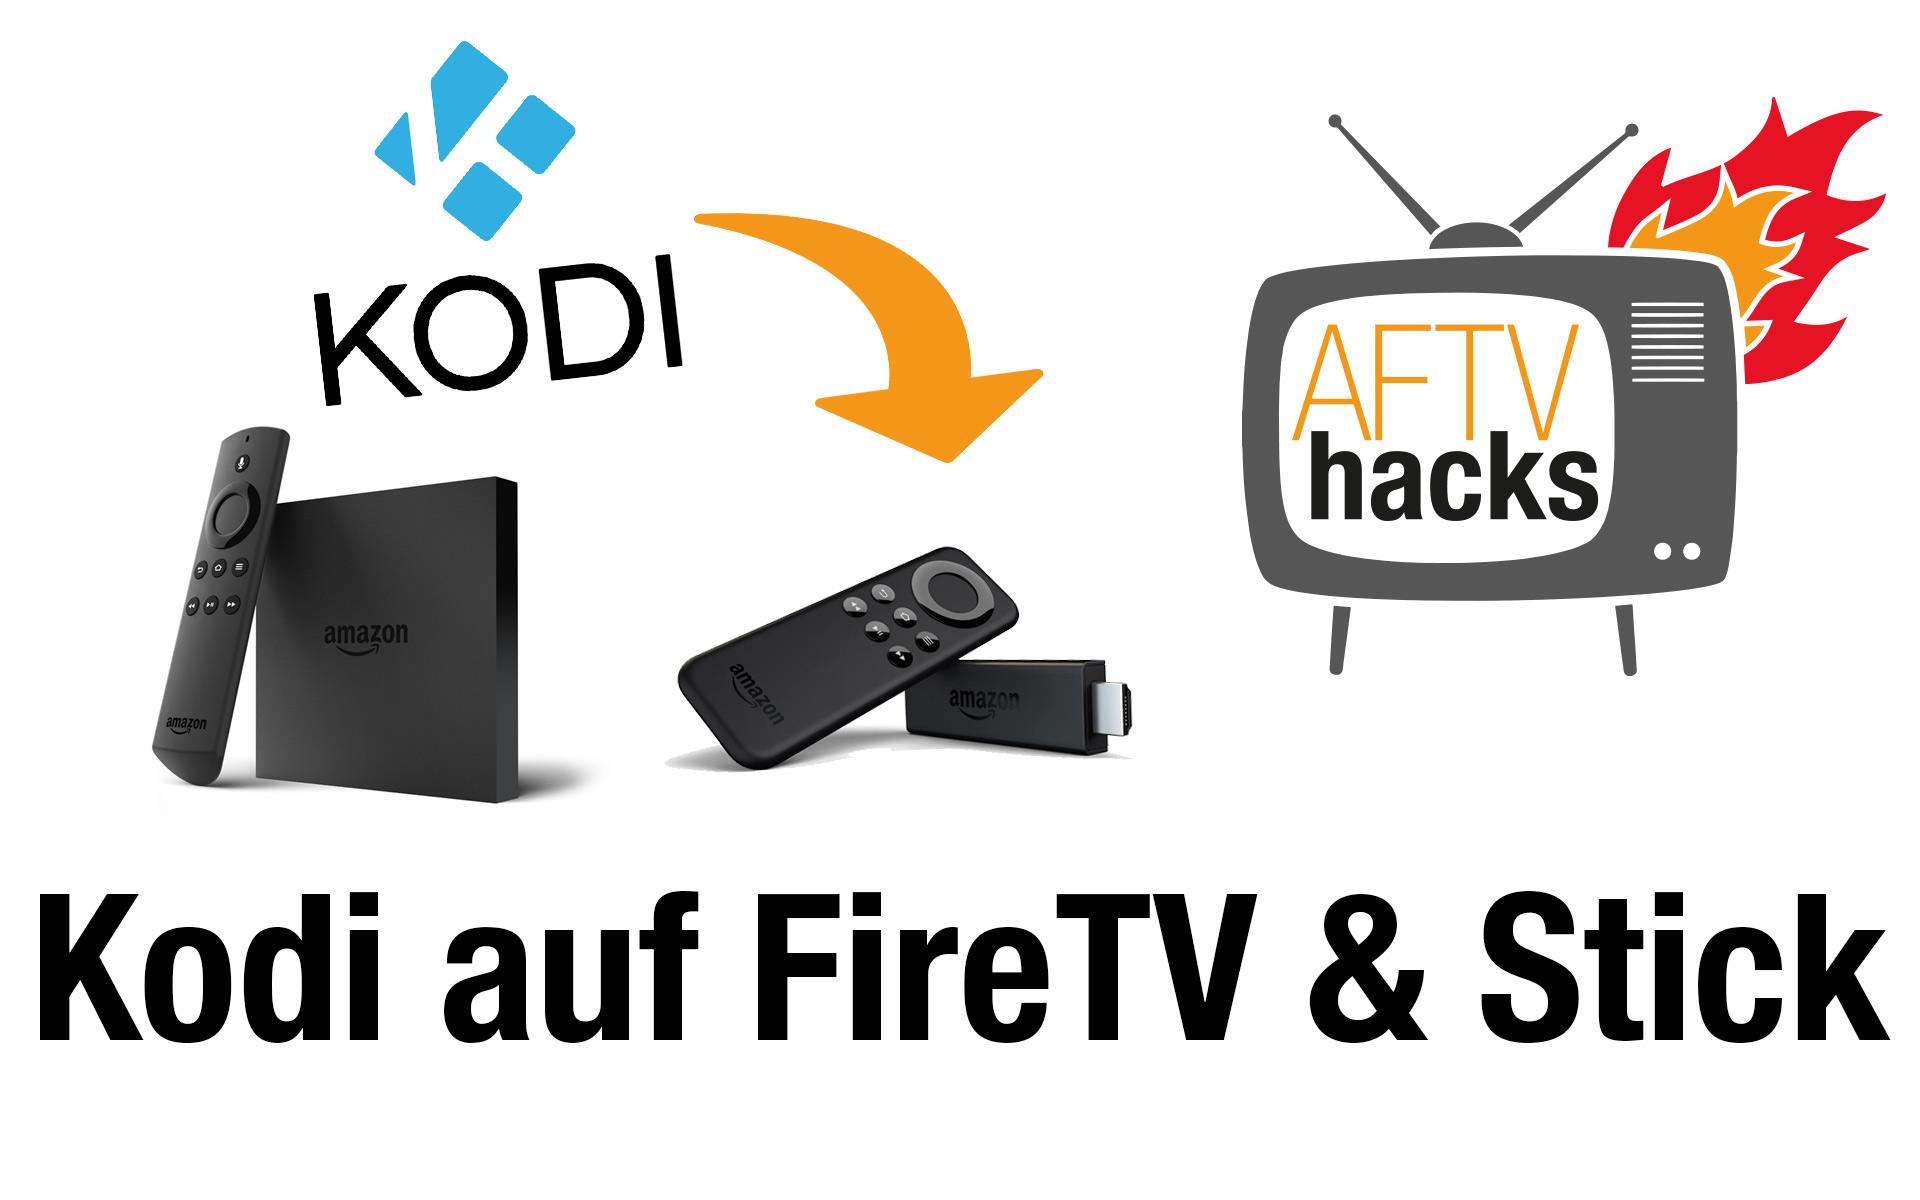 Anleitung: Kodi auf dem Fire TV 1, 2 & Stick installieren (ab Firmware 5.0.5.1)